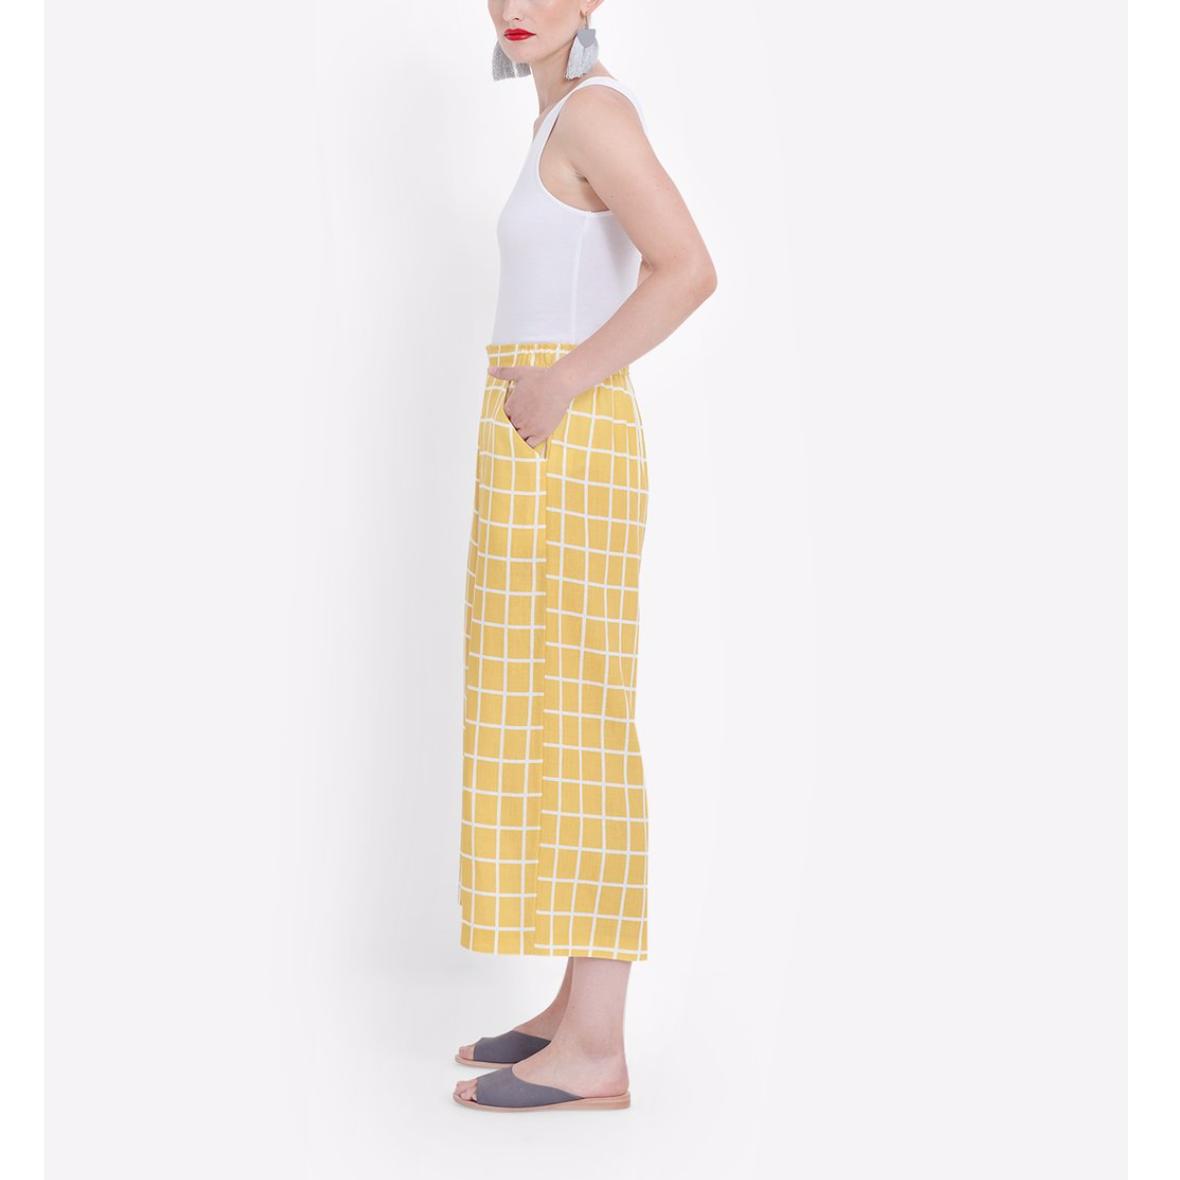 Hopen Pants - Yellow/White